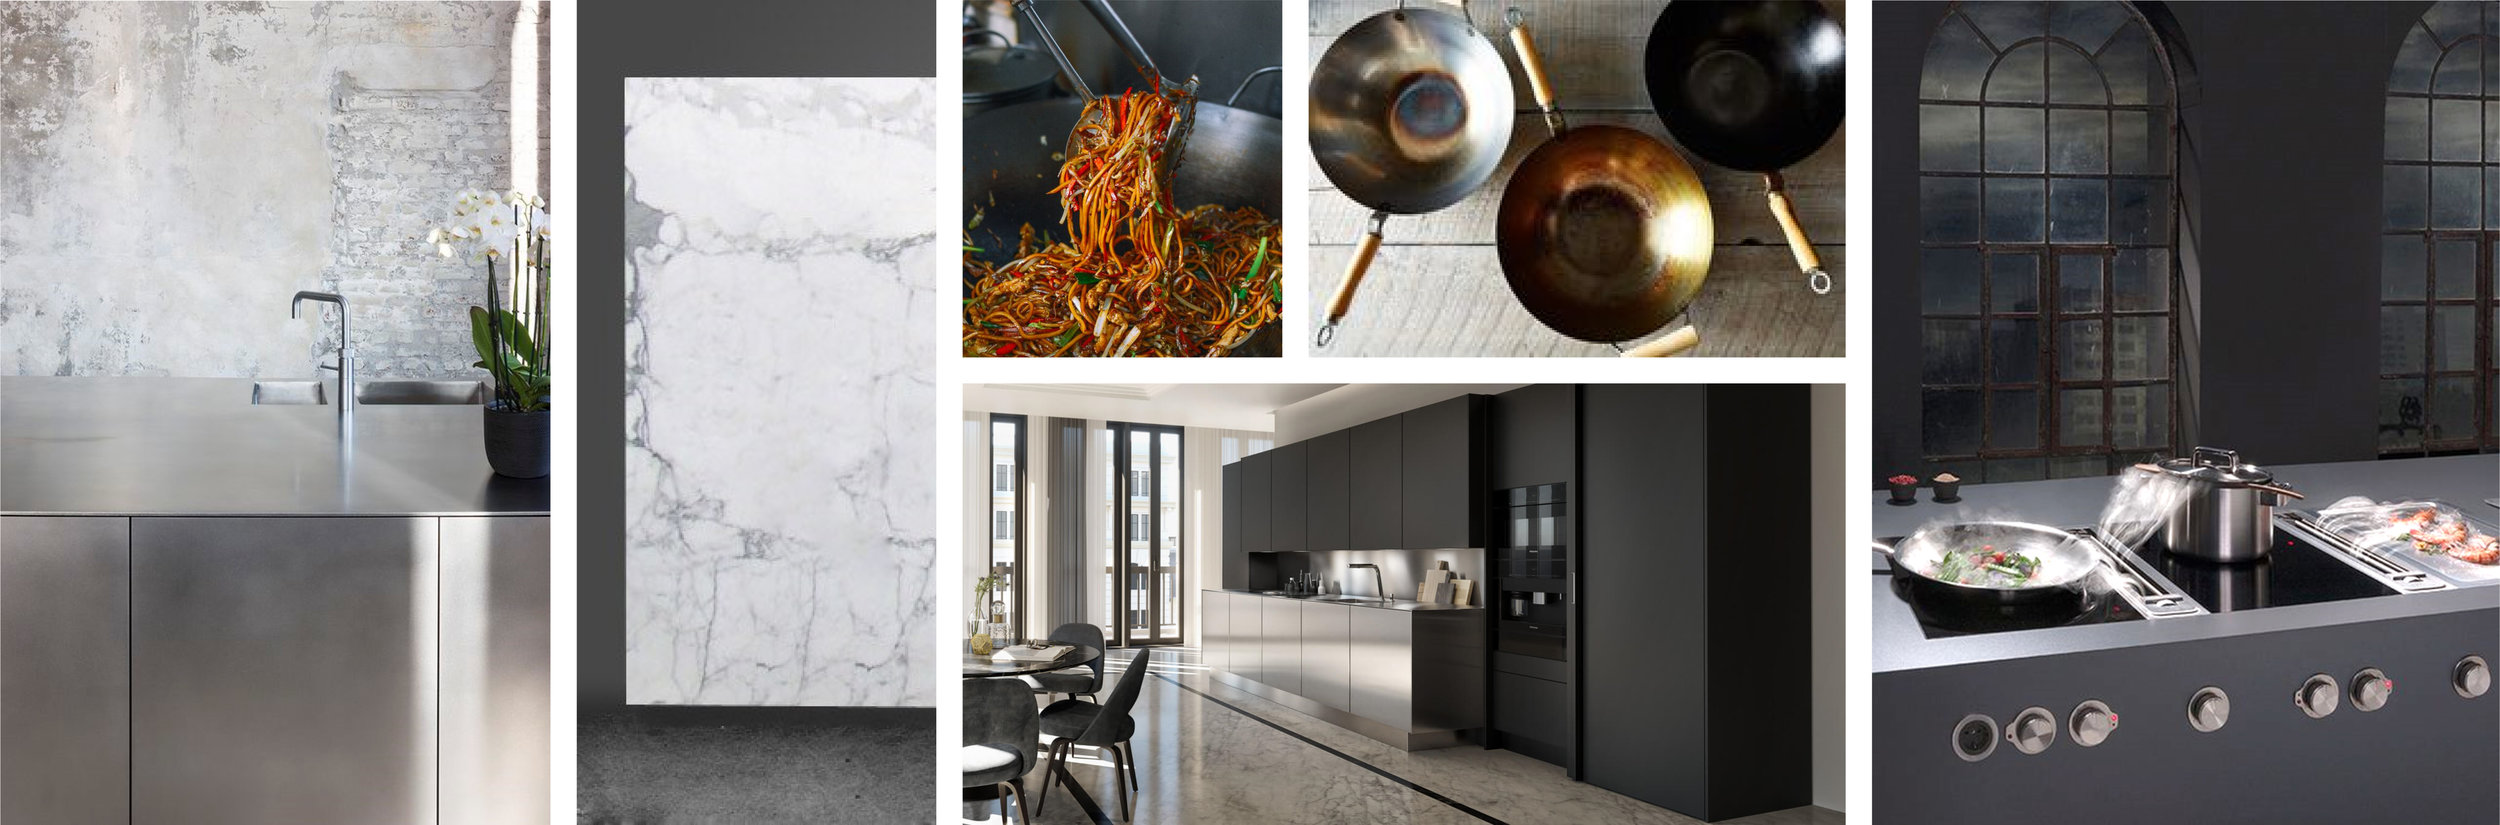 Tian Concept Board - Wok Kitchen.jpg